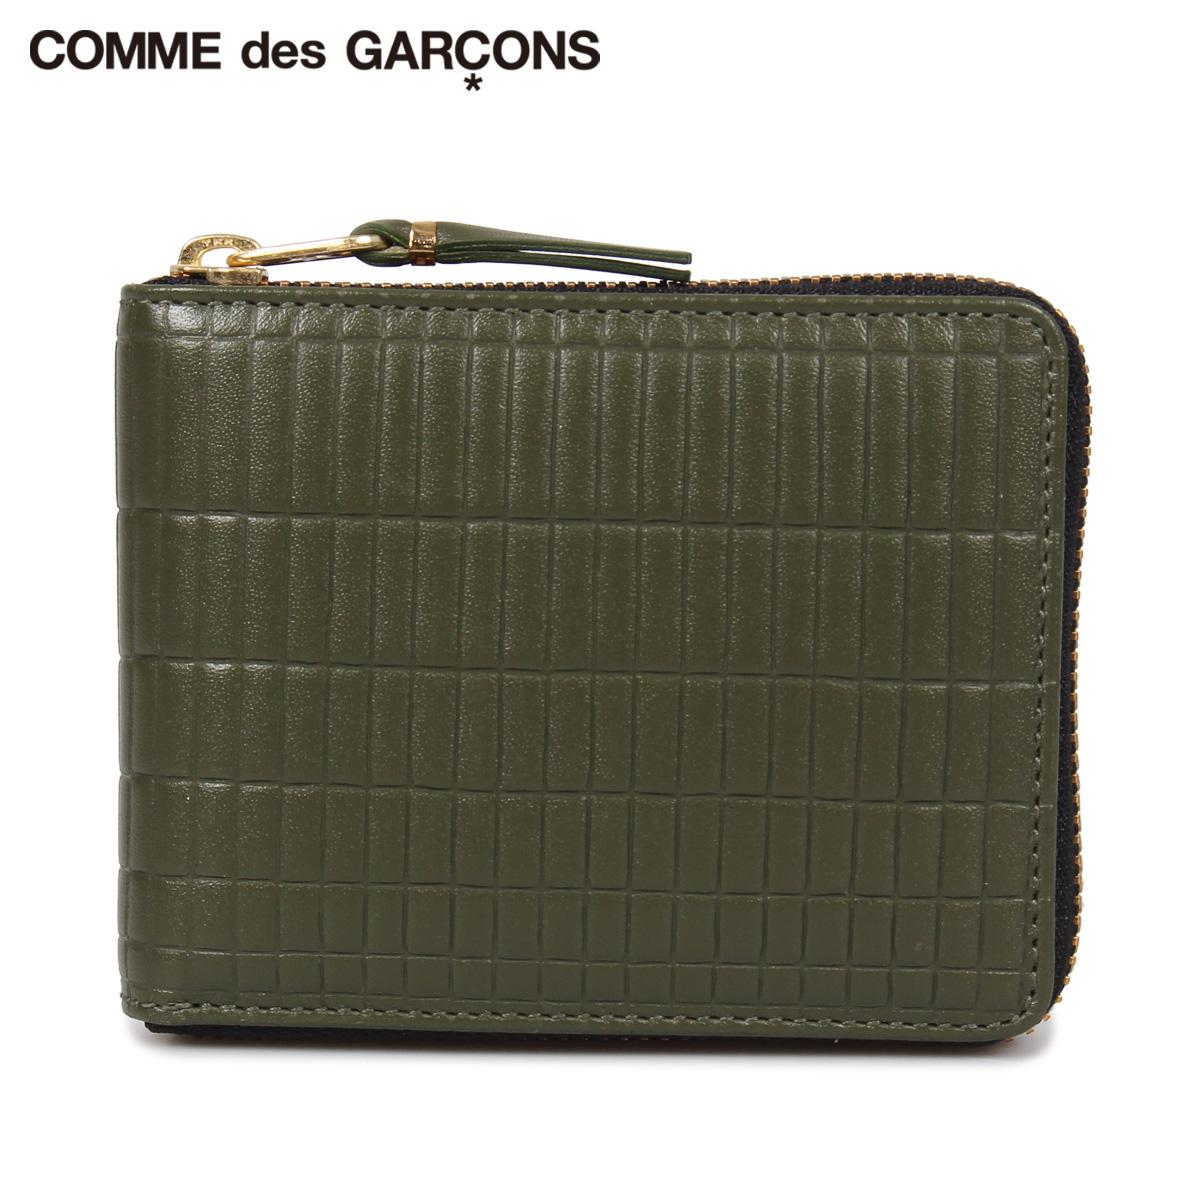 COMME des GARCONS BRICK WALLET コムデギャルソン 財布 二つ折り メンズ レディース 本革 ラウンドファスナー カーキ SA7100BK [10/10 新入荷]